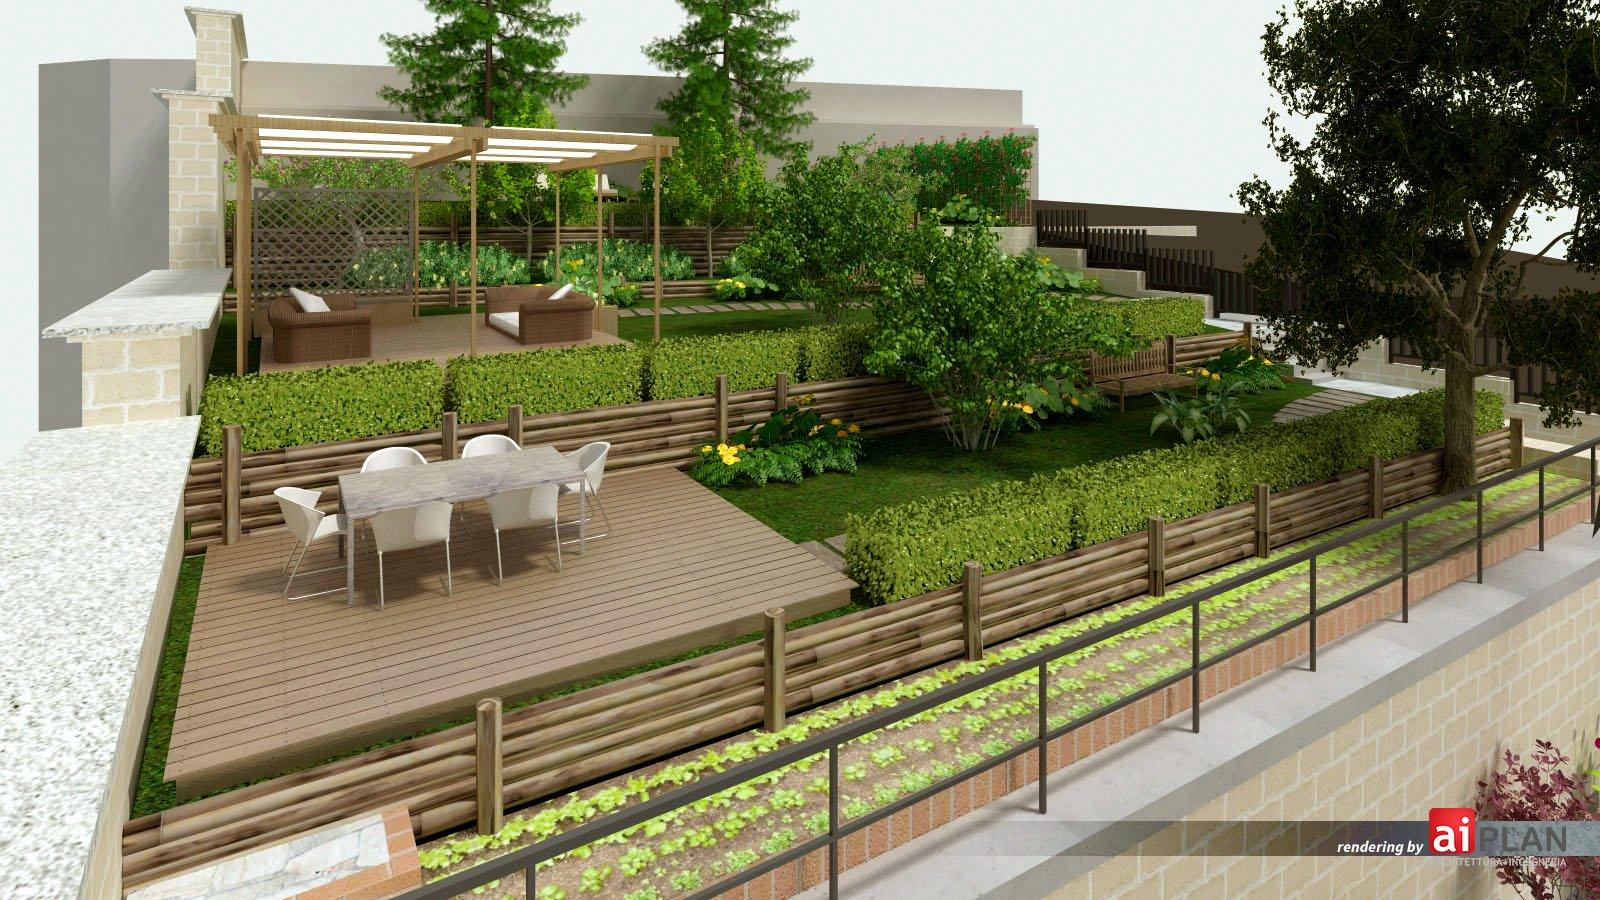 Rendering di giardini parchi e sistemi di verde aiplan for Rendering giardino